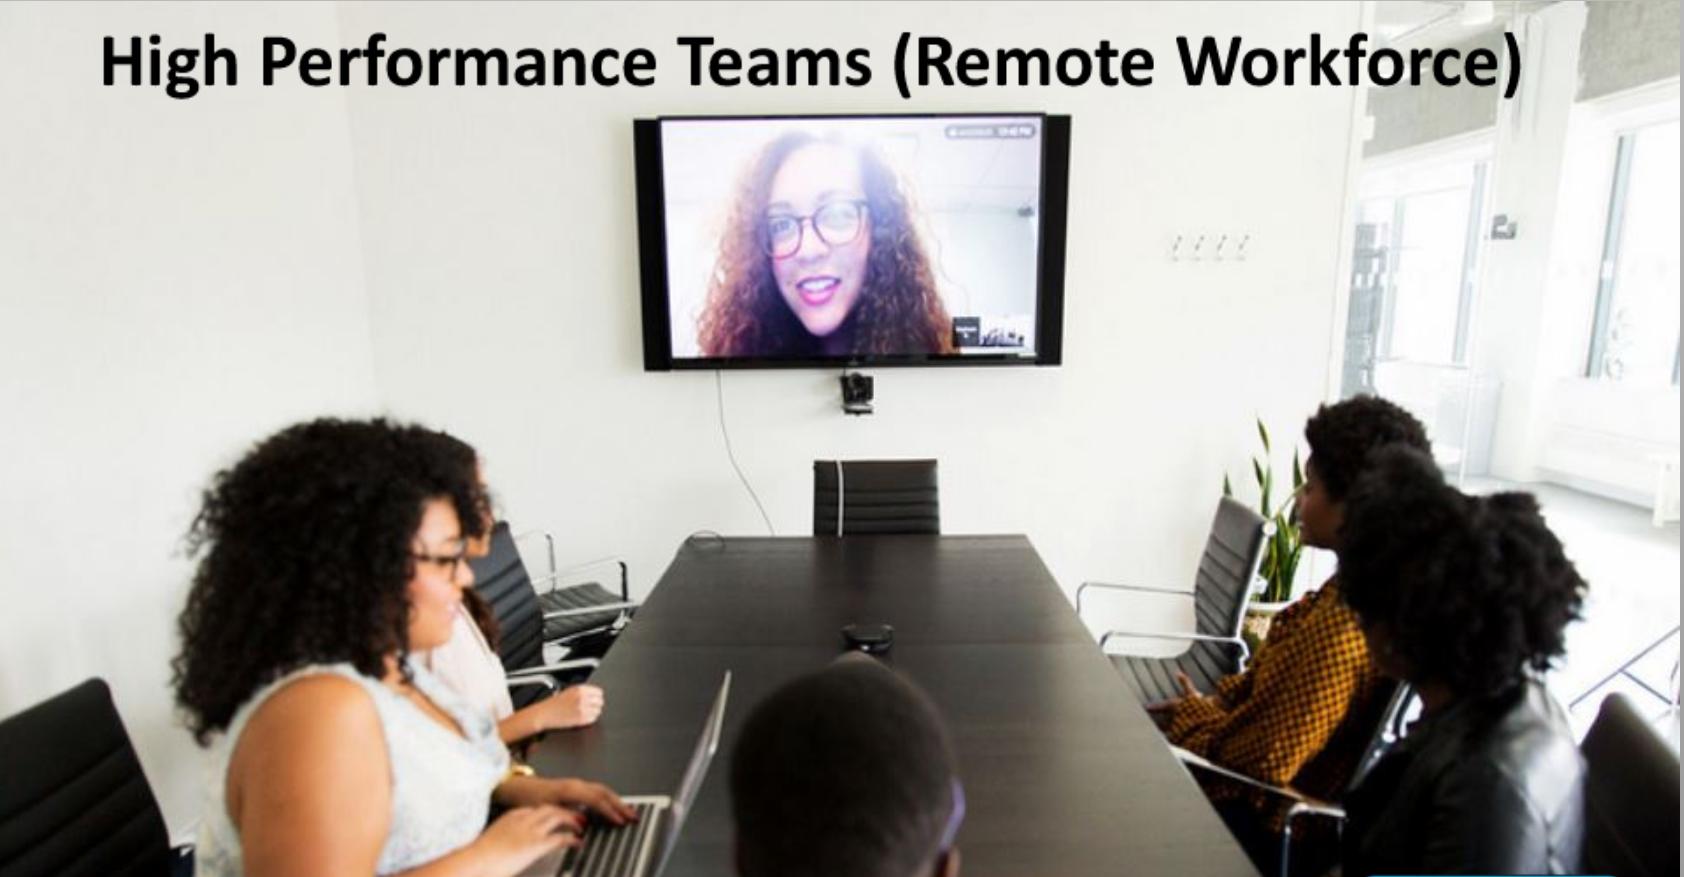 Building High Performance Teams (Externally)